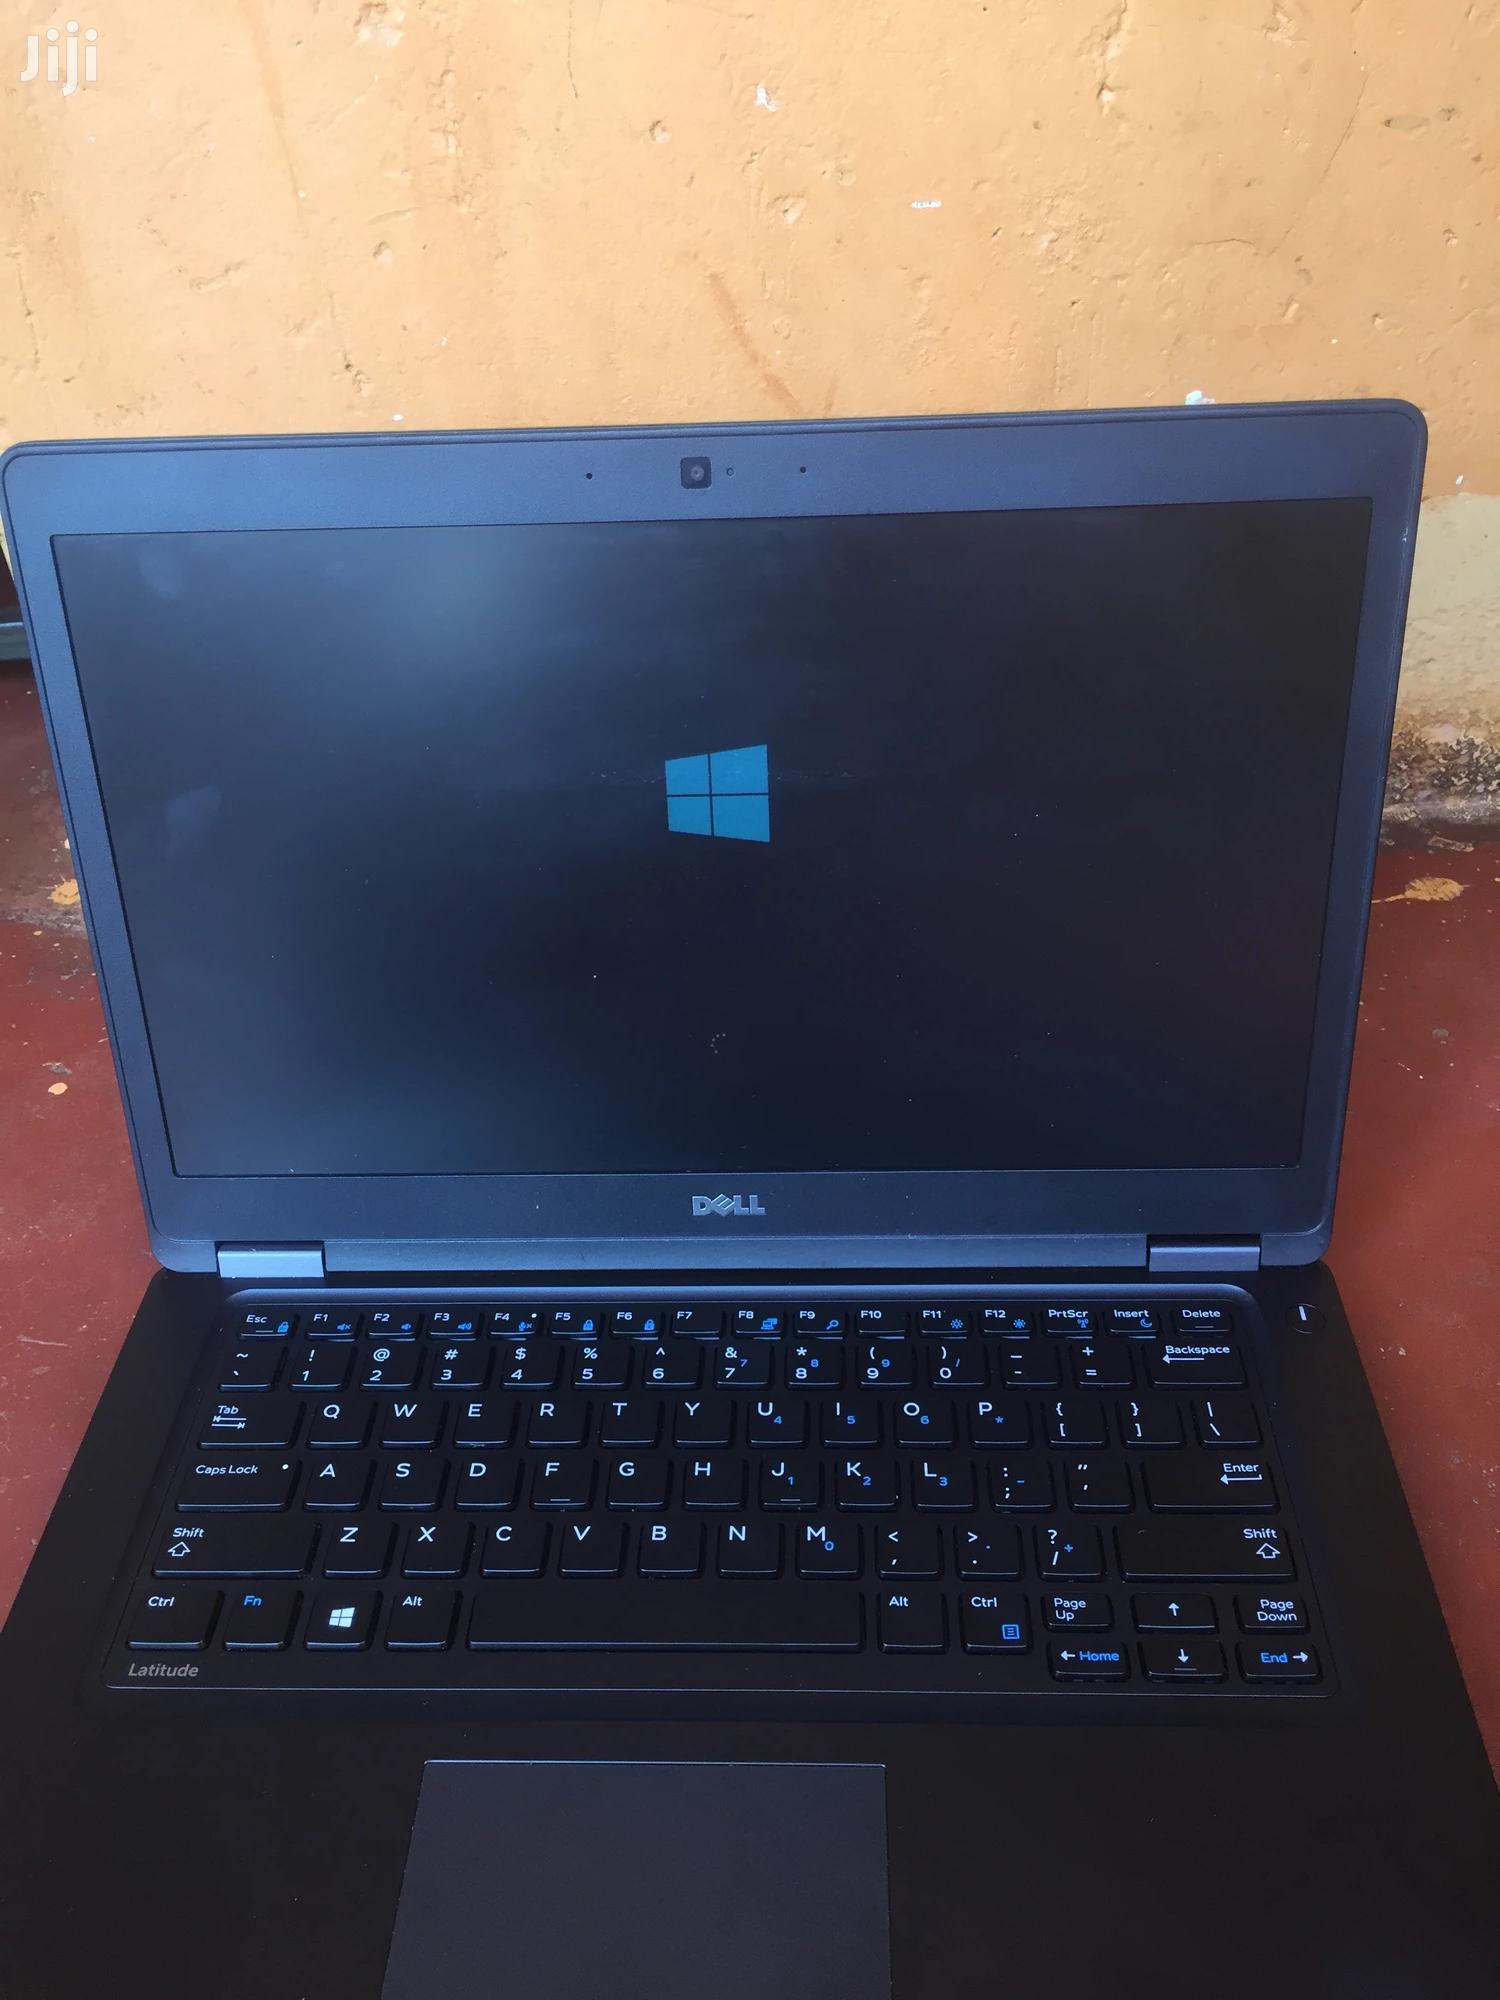 Laptop Dell Latitude 14 5480 8GB Intel Core i5 HDD 500GB | Laptops & Computers for sale in Kampala, Central Region, Uganda